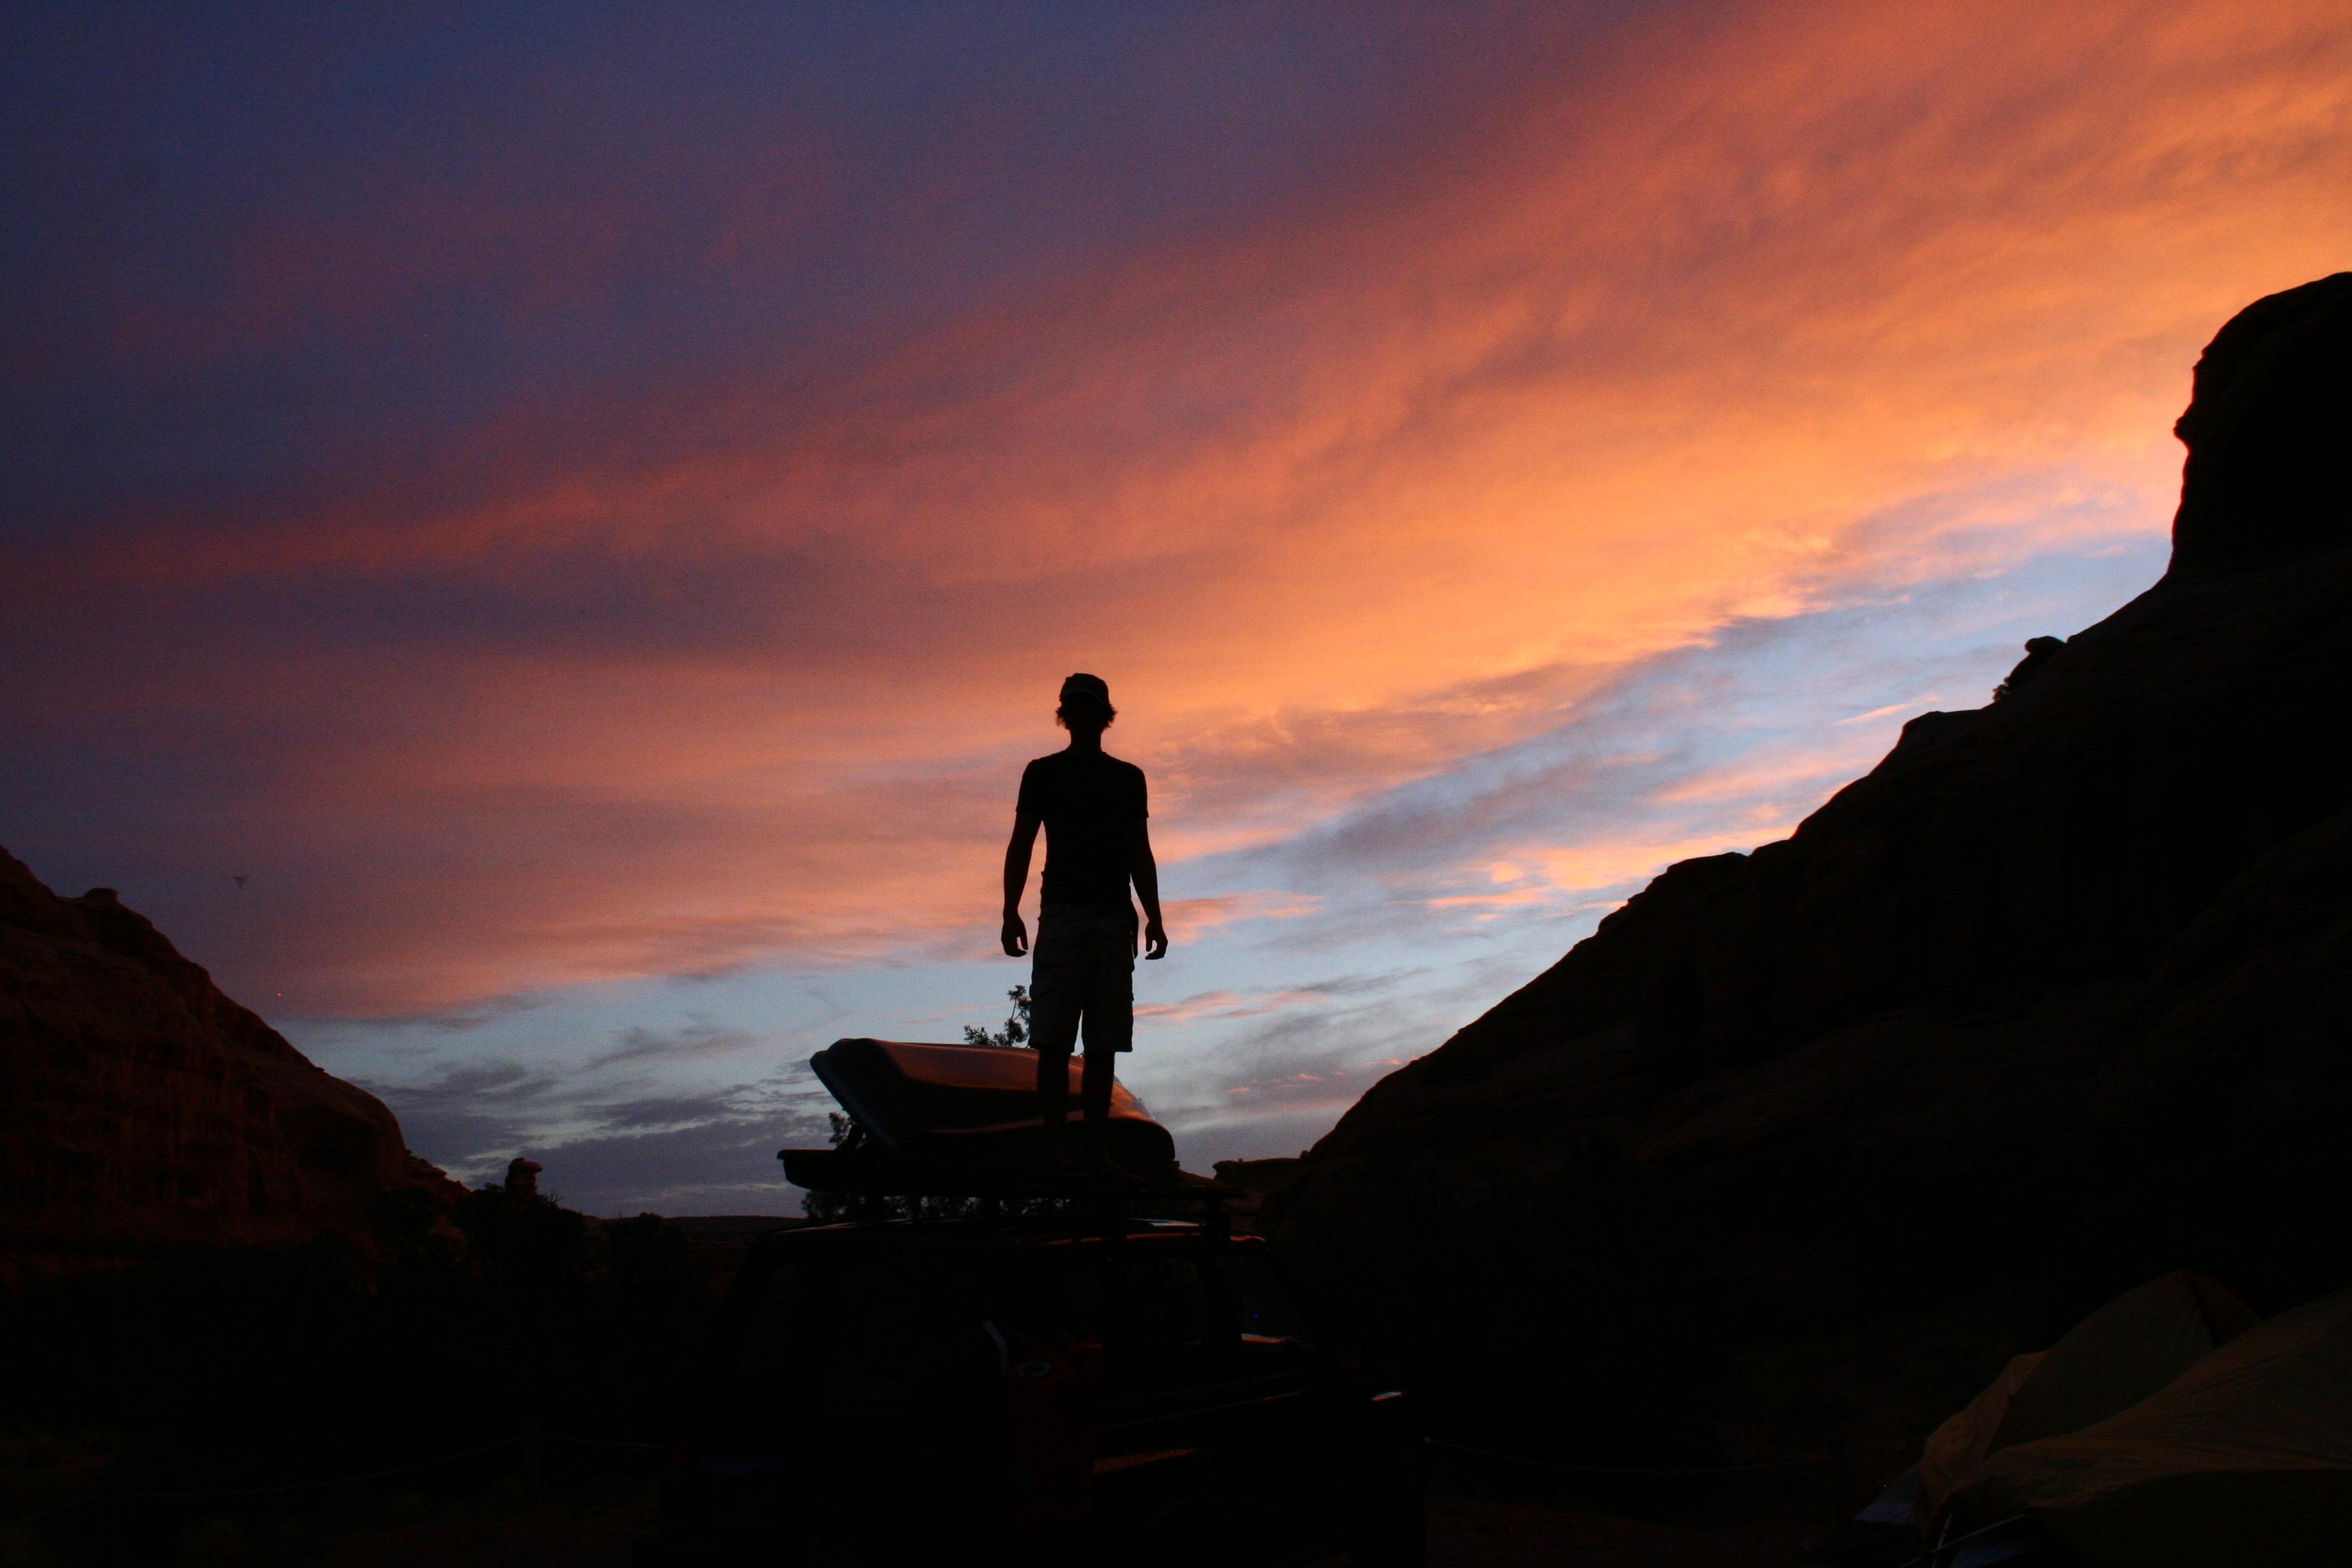 Sunset at Gemini Bridges, Moab